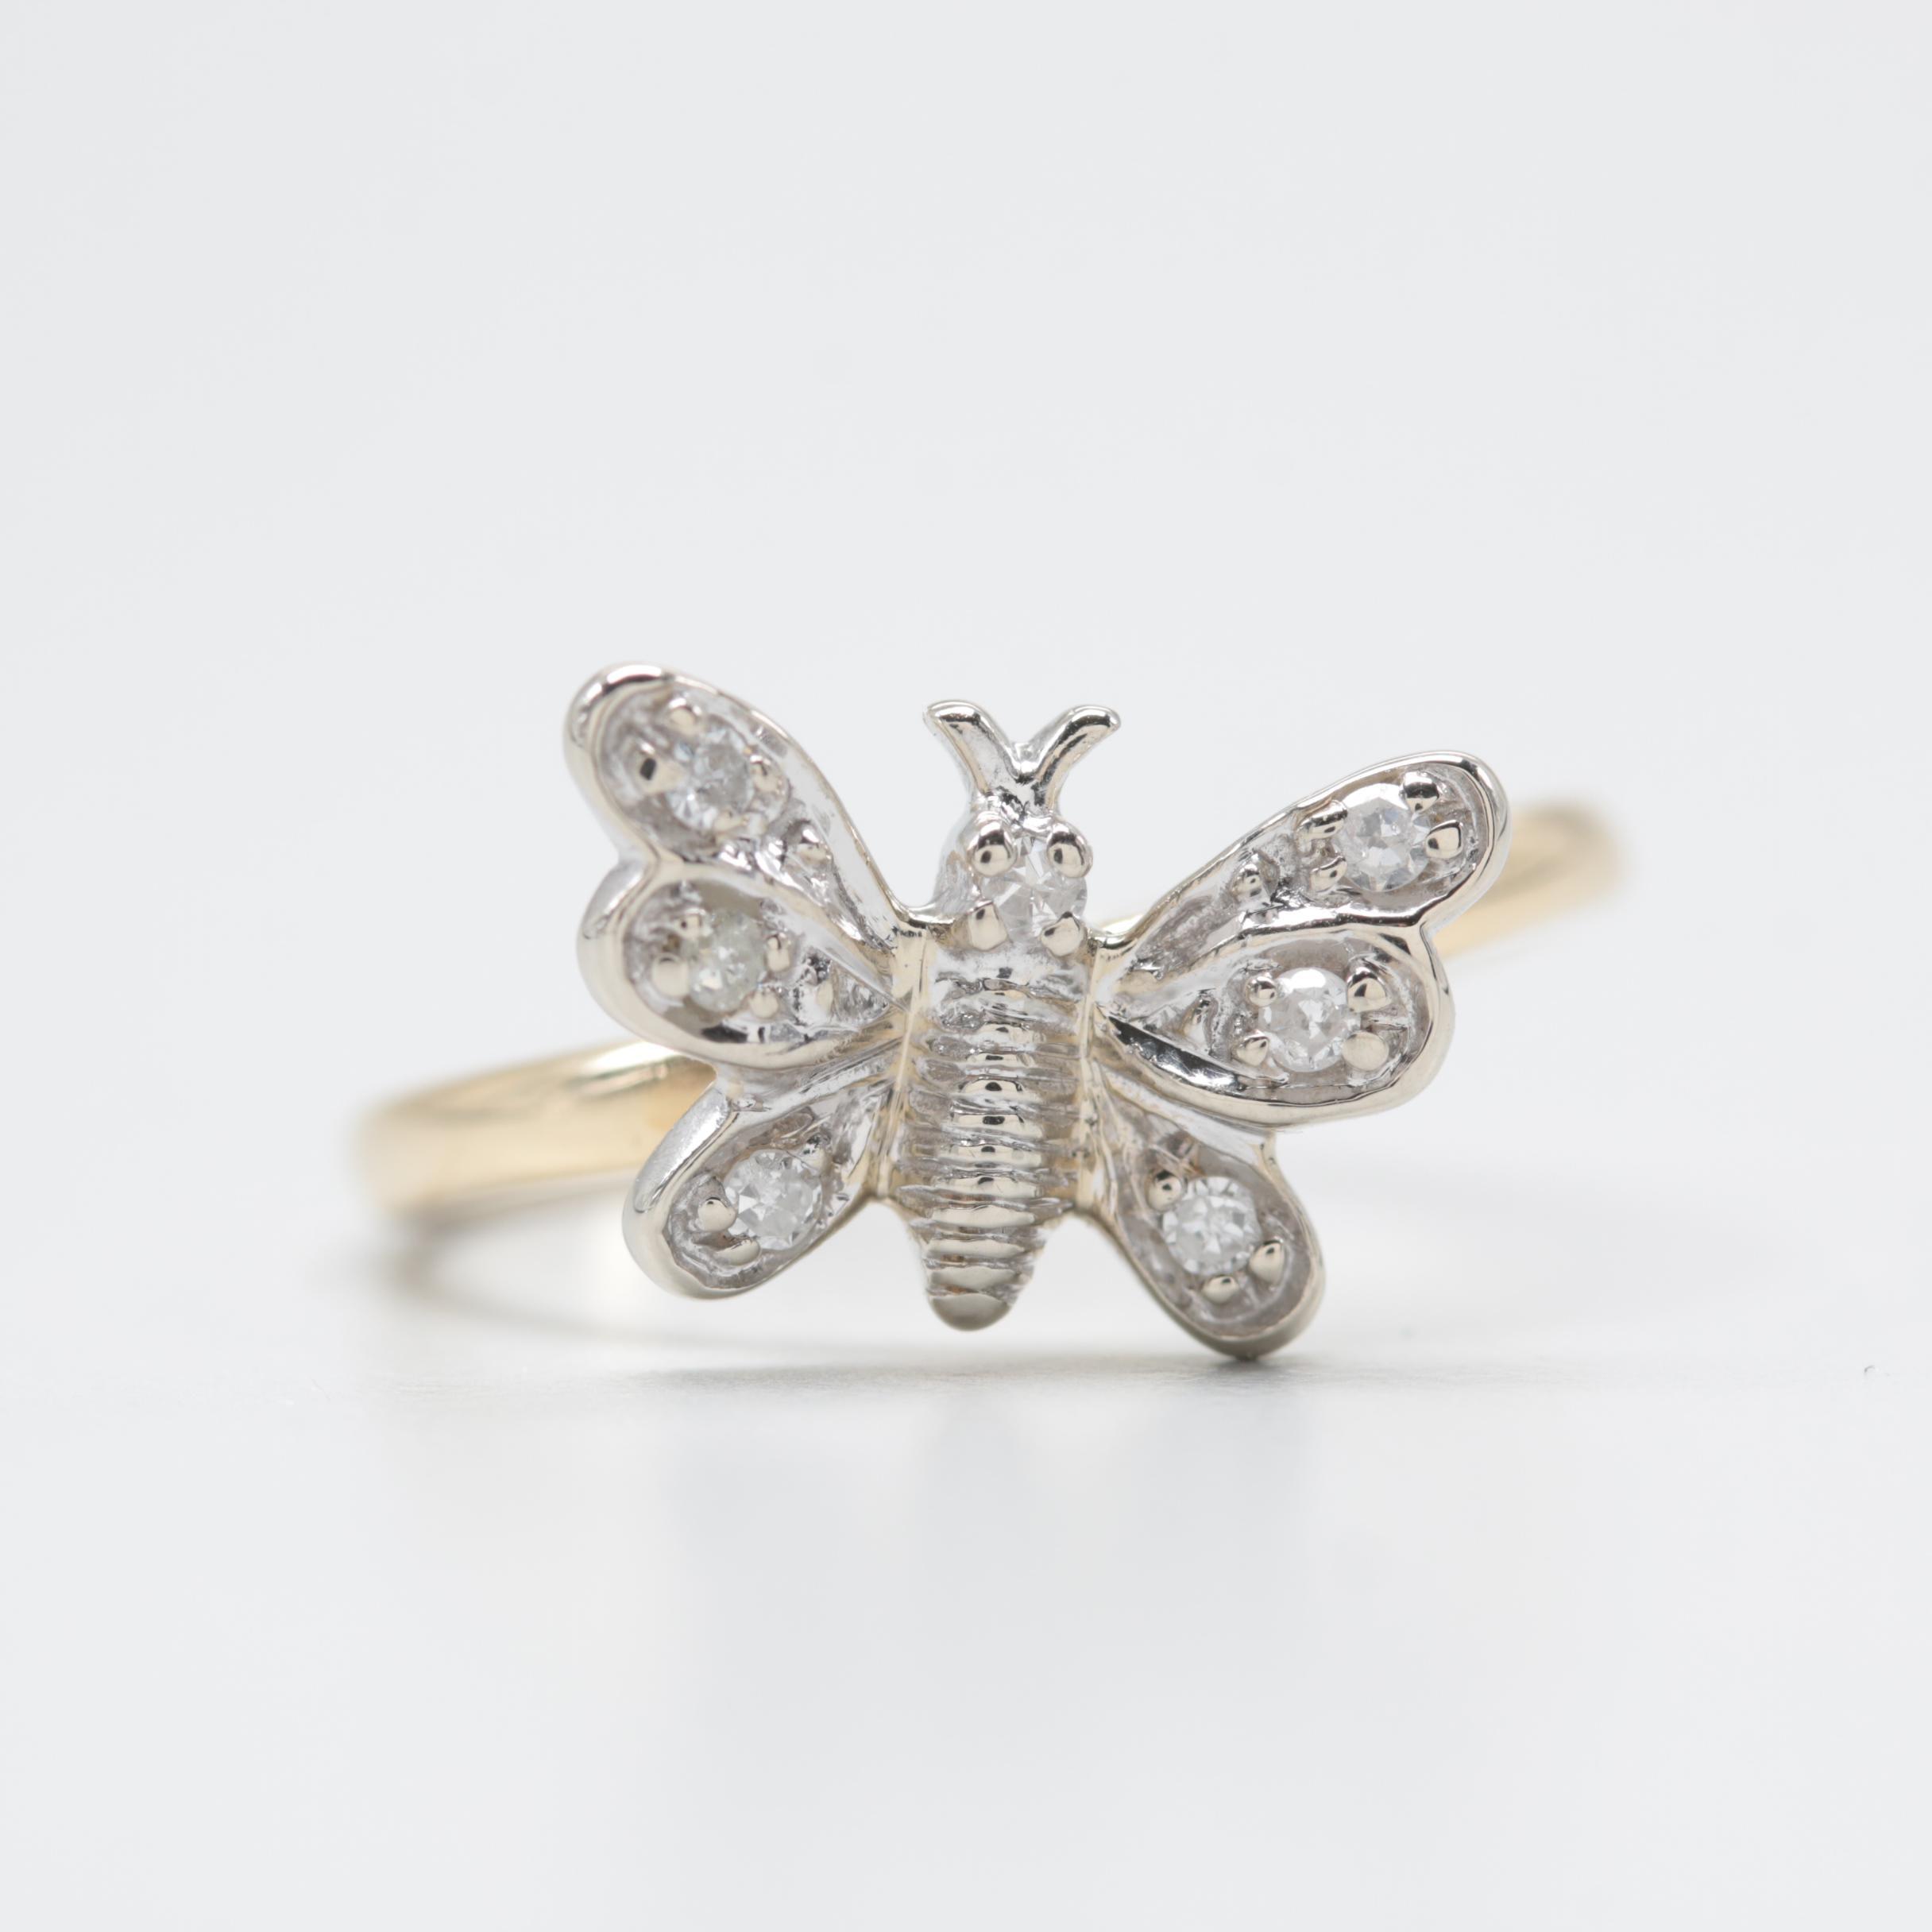 14K Yellow Gold Diamond Ring Butterfly Motif